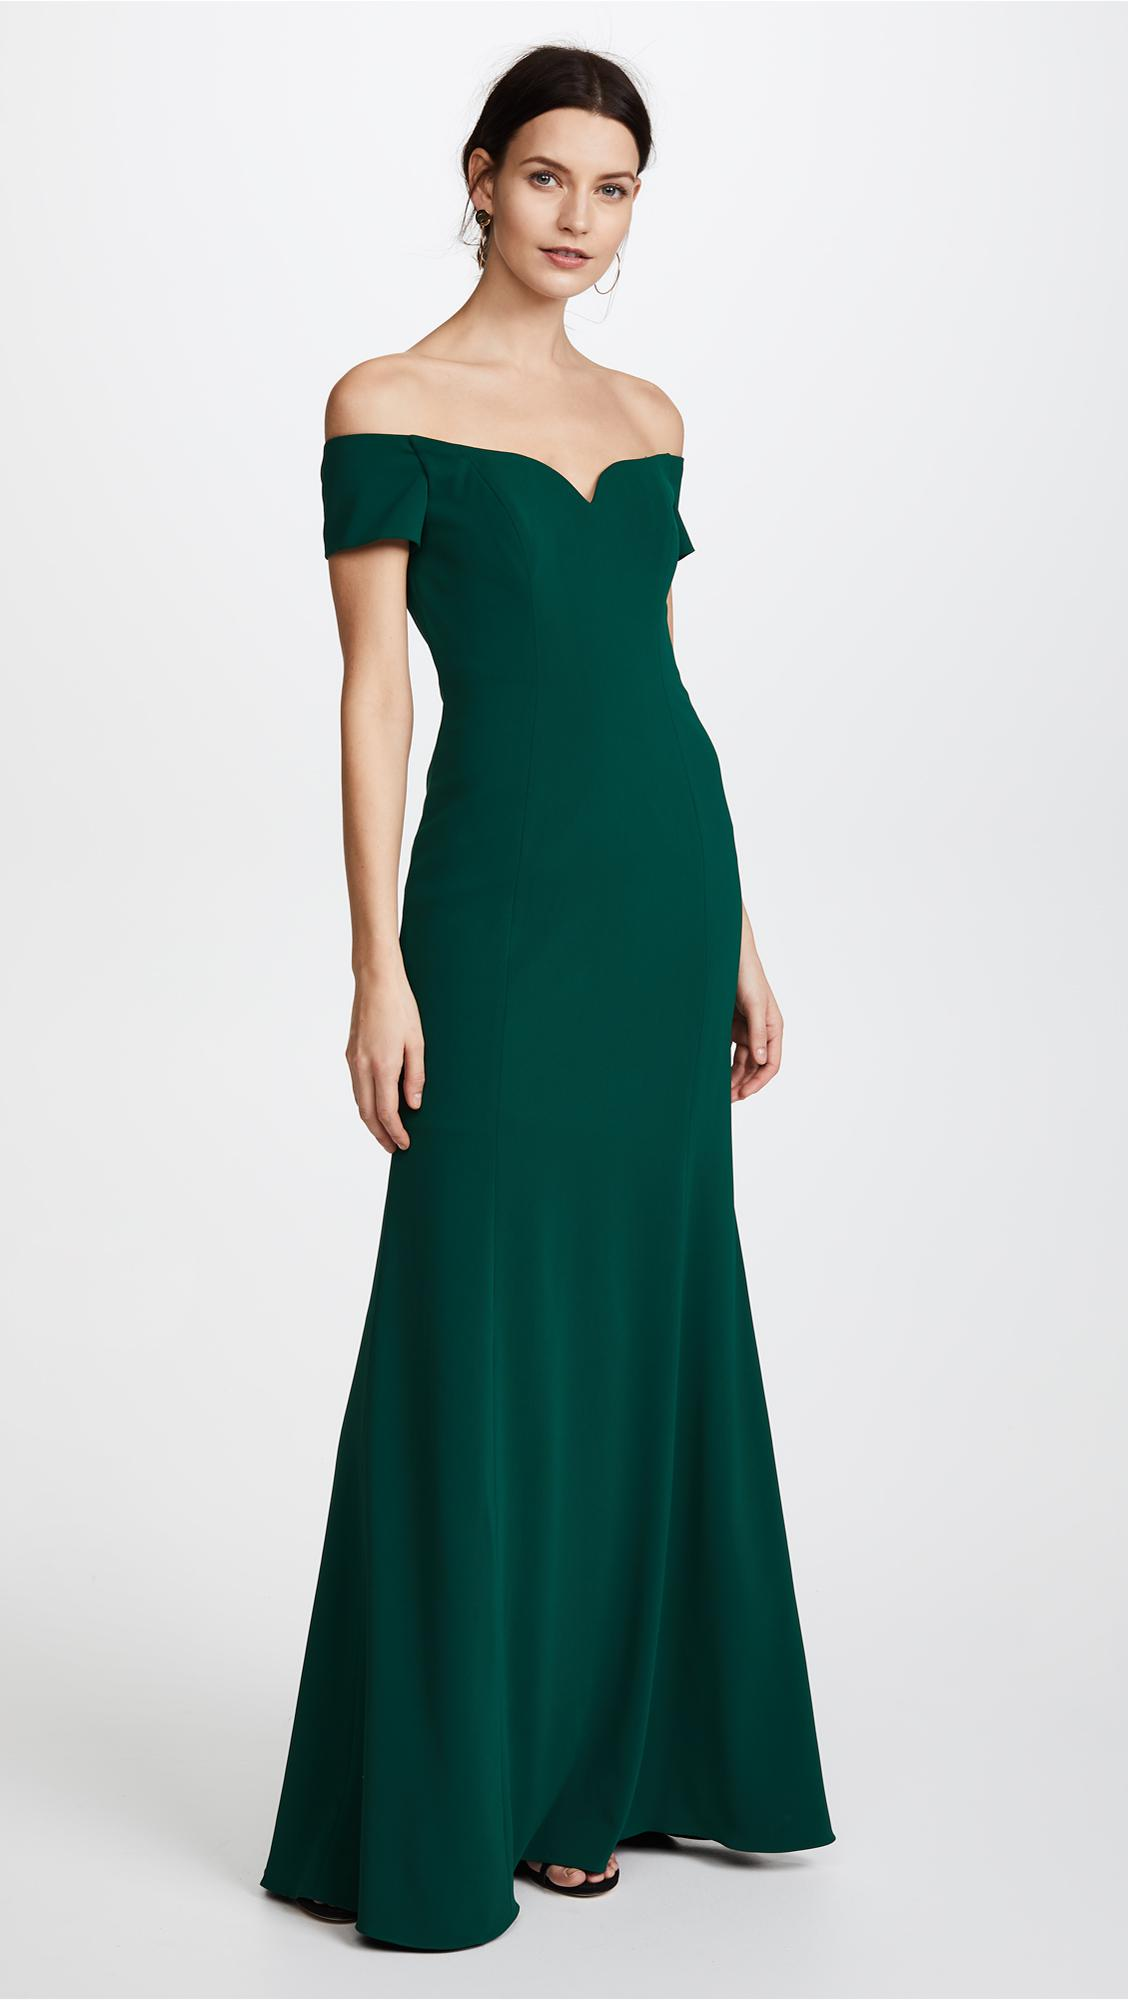 Lyst - Badgley Mischka Off Shoulder Short Sleeve Gown in Green - photo#6